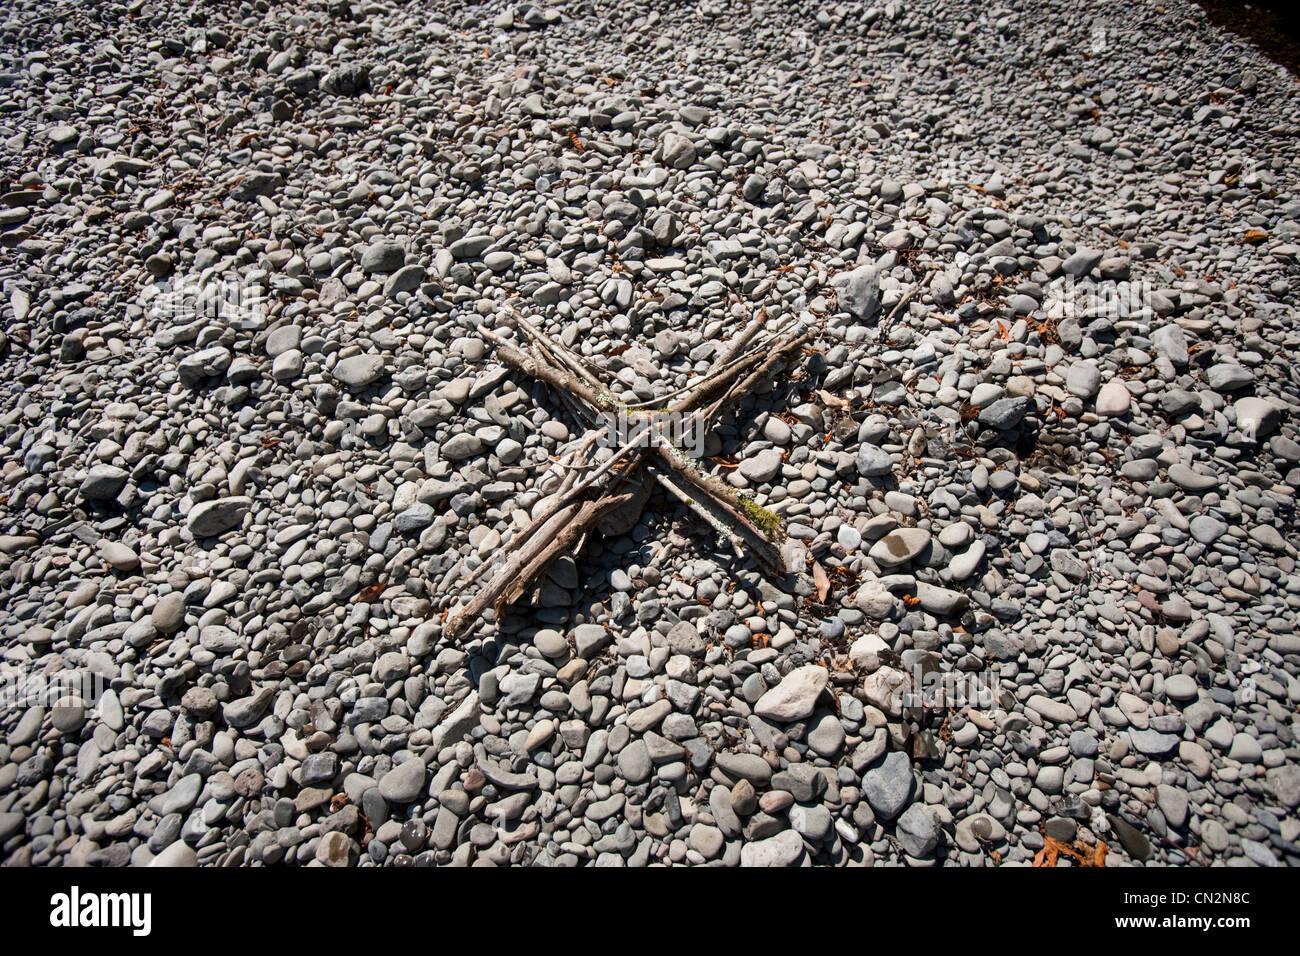 Sticks in cross shape on pebbles - Stock Image